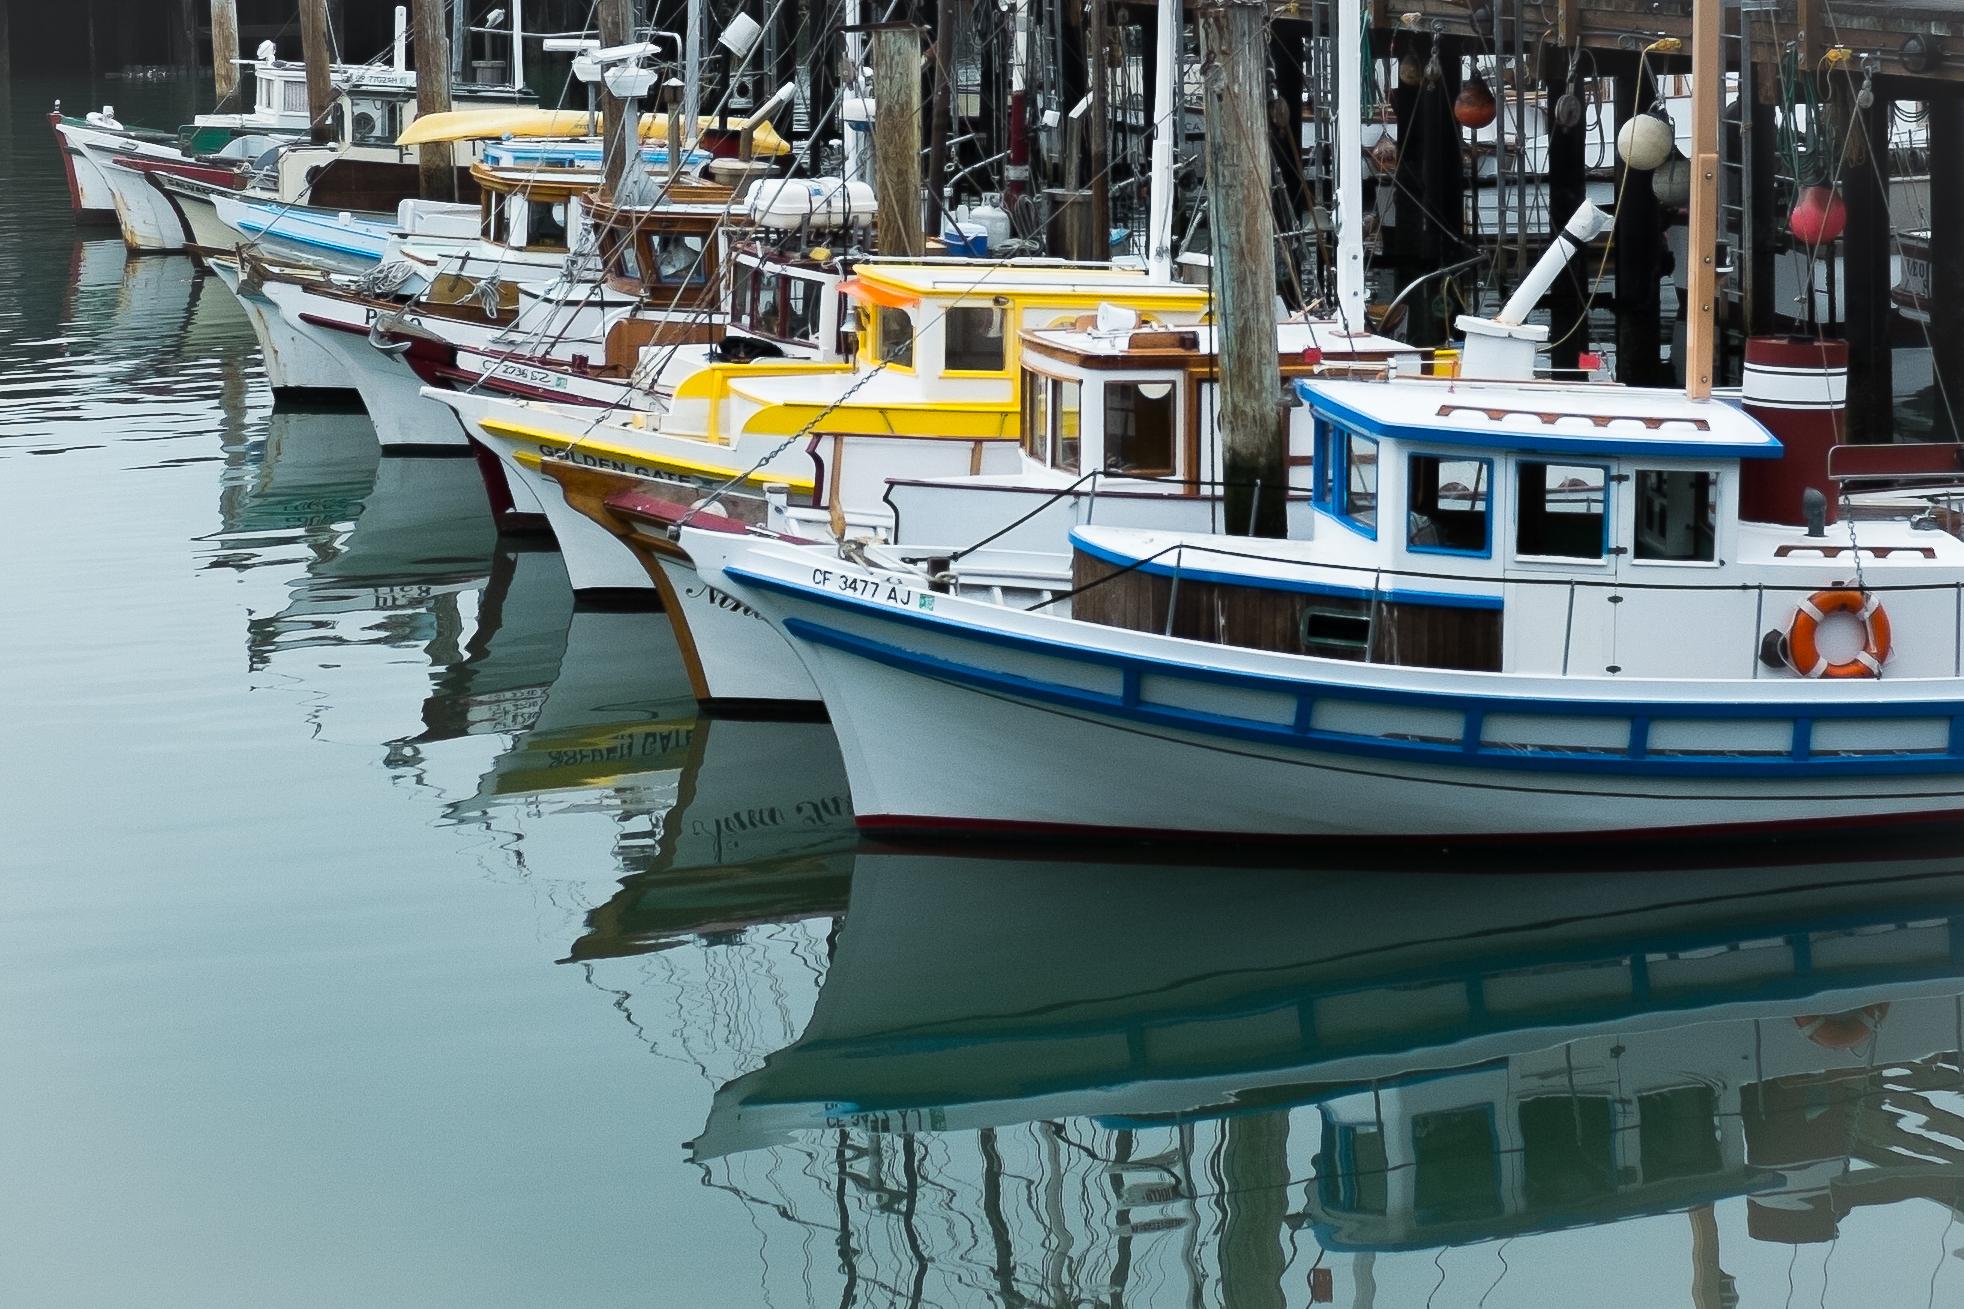 Fishermans Wharf, San Francisco, CA, Fuji X100T